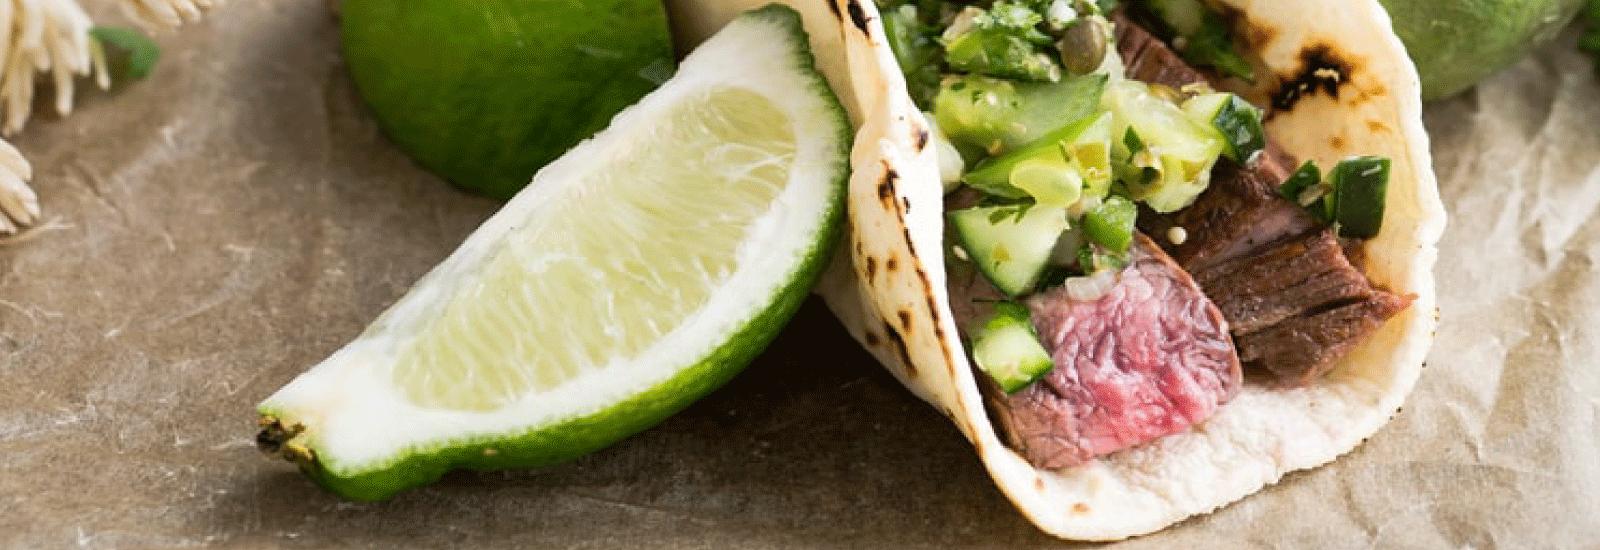 Mexican Cuisine Near Davis-Monthan AFB